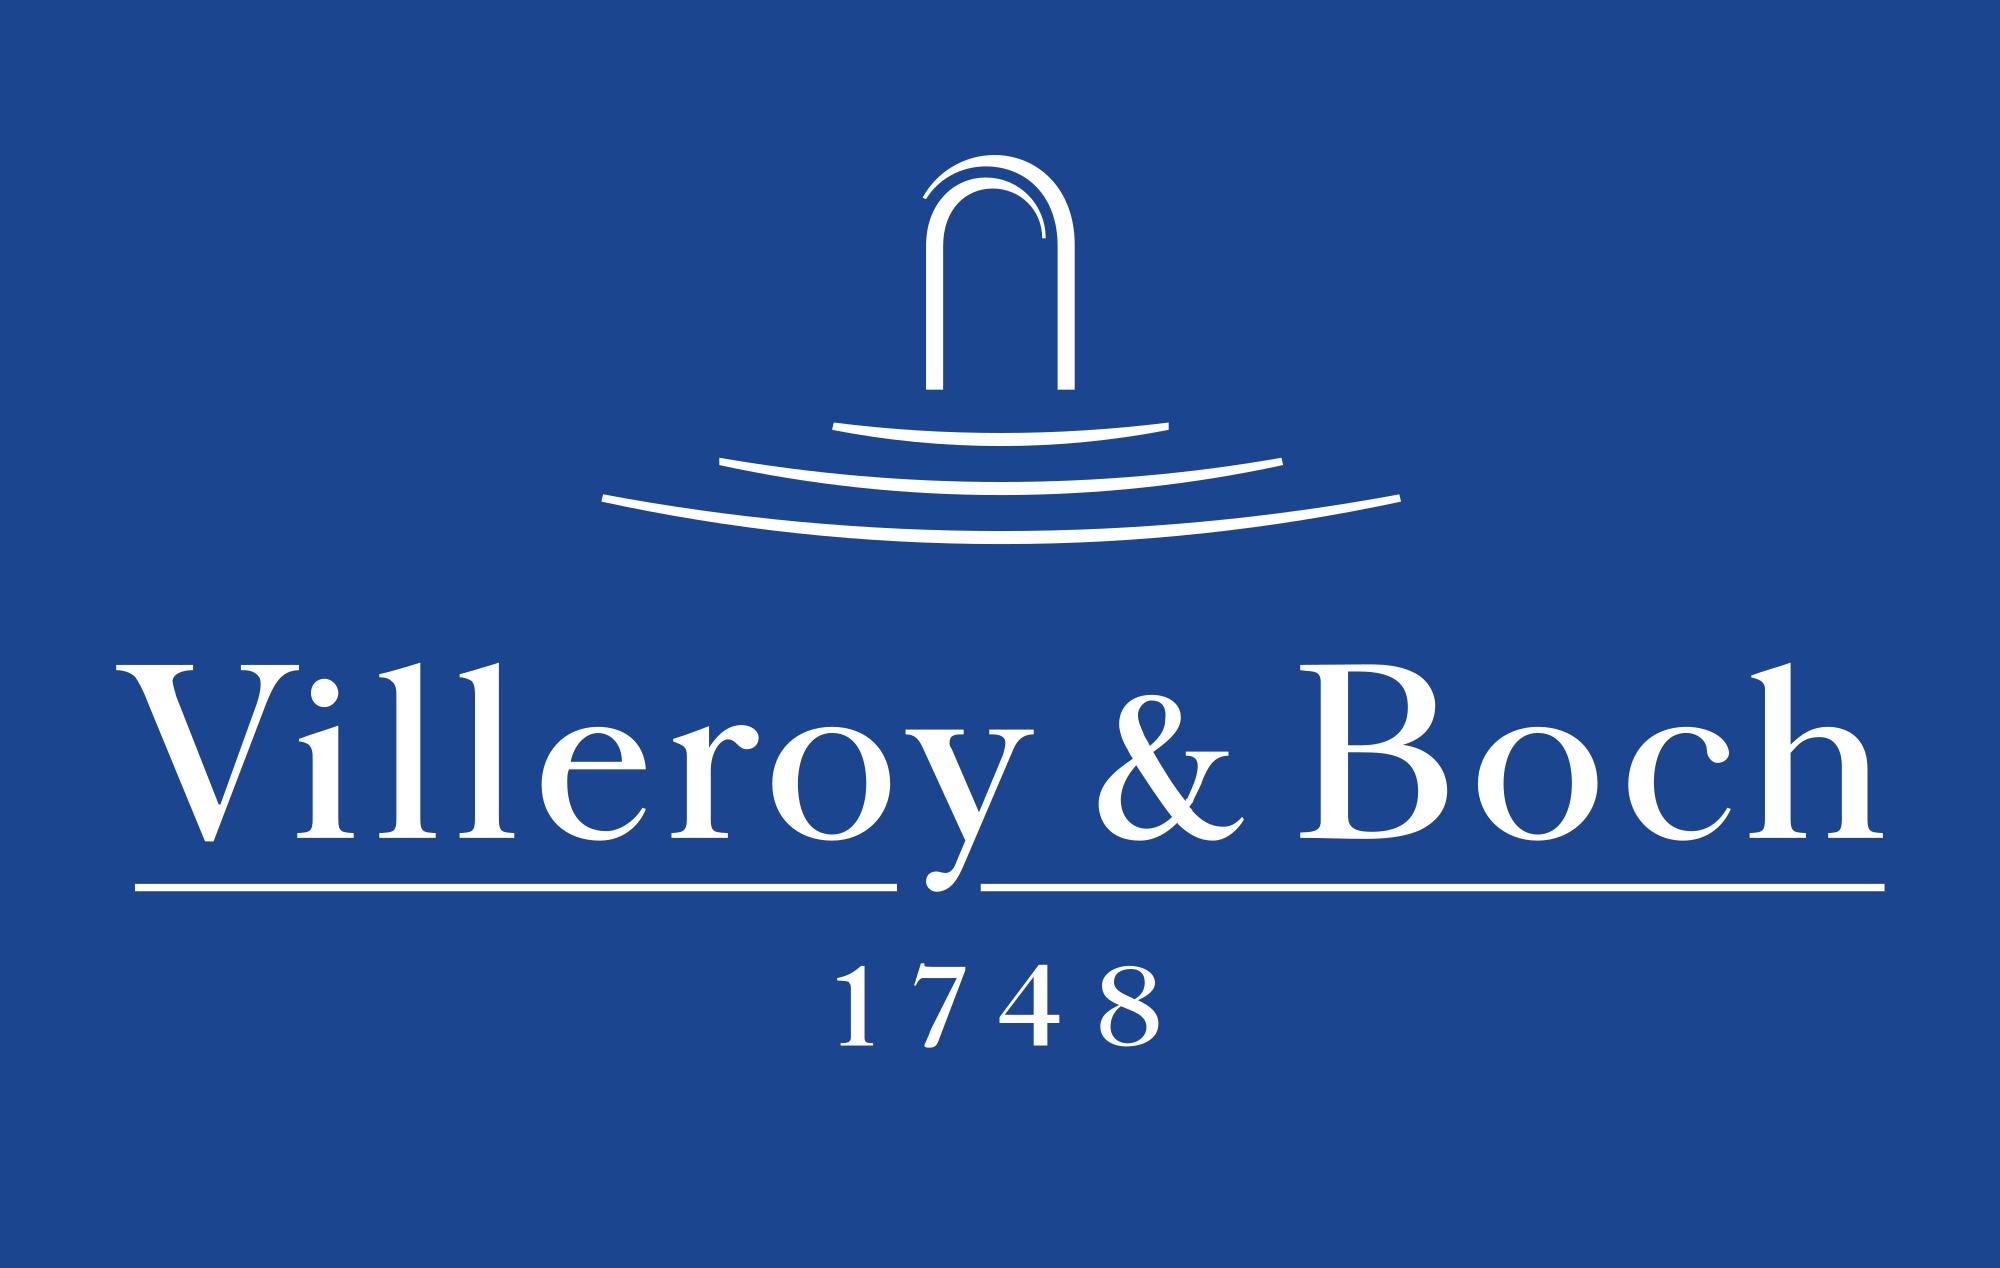 Villeroy & boch.png